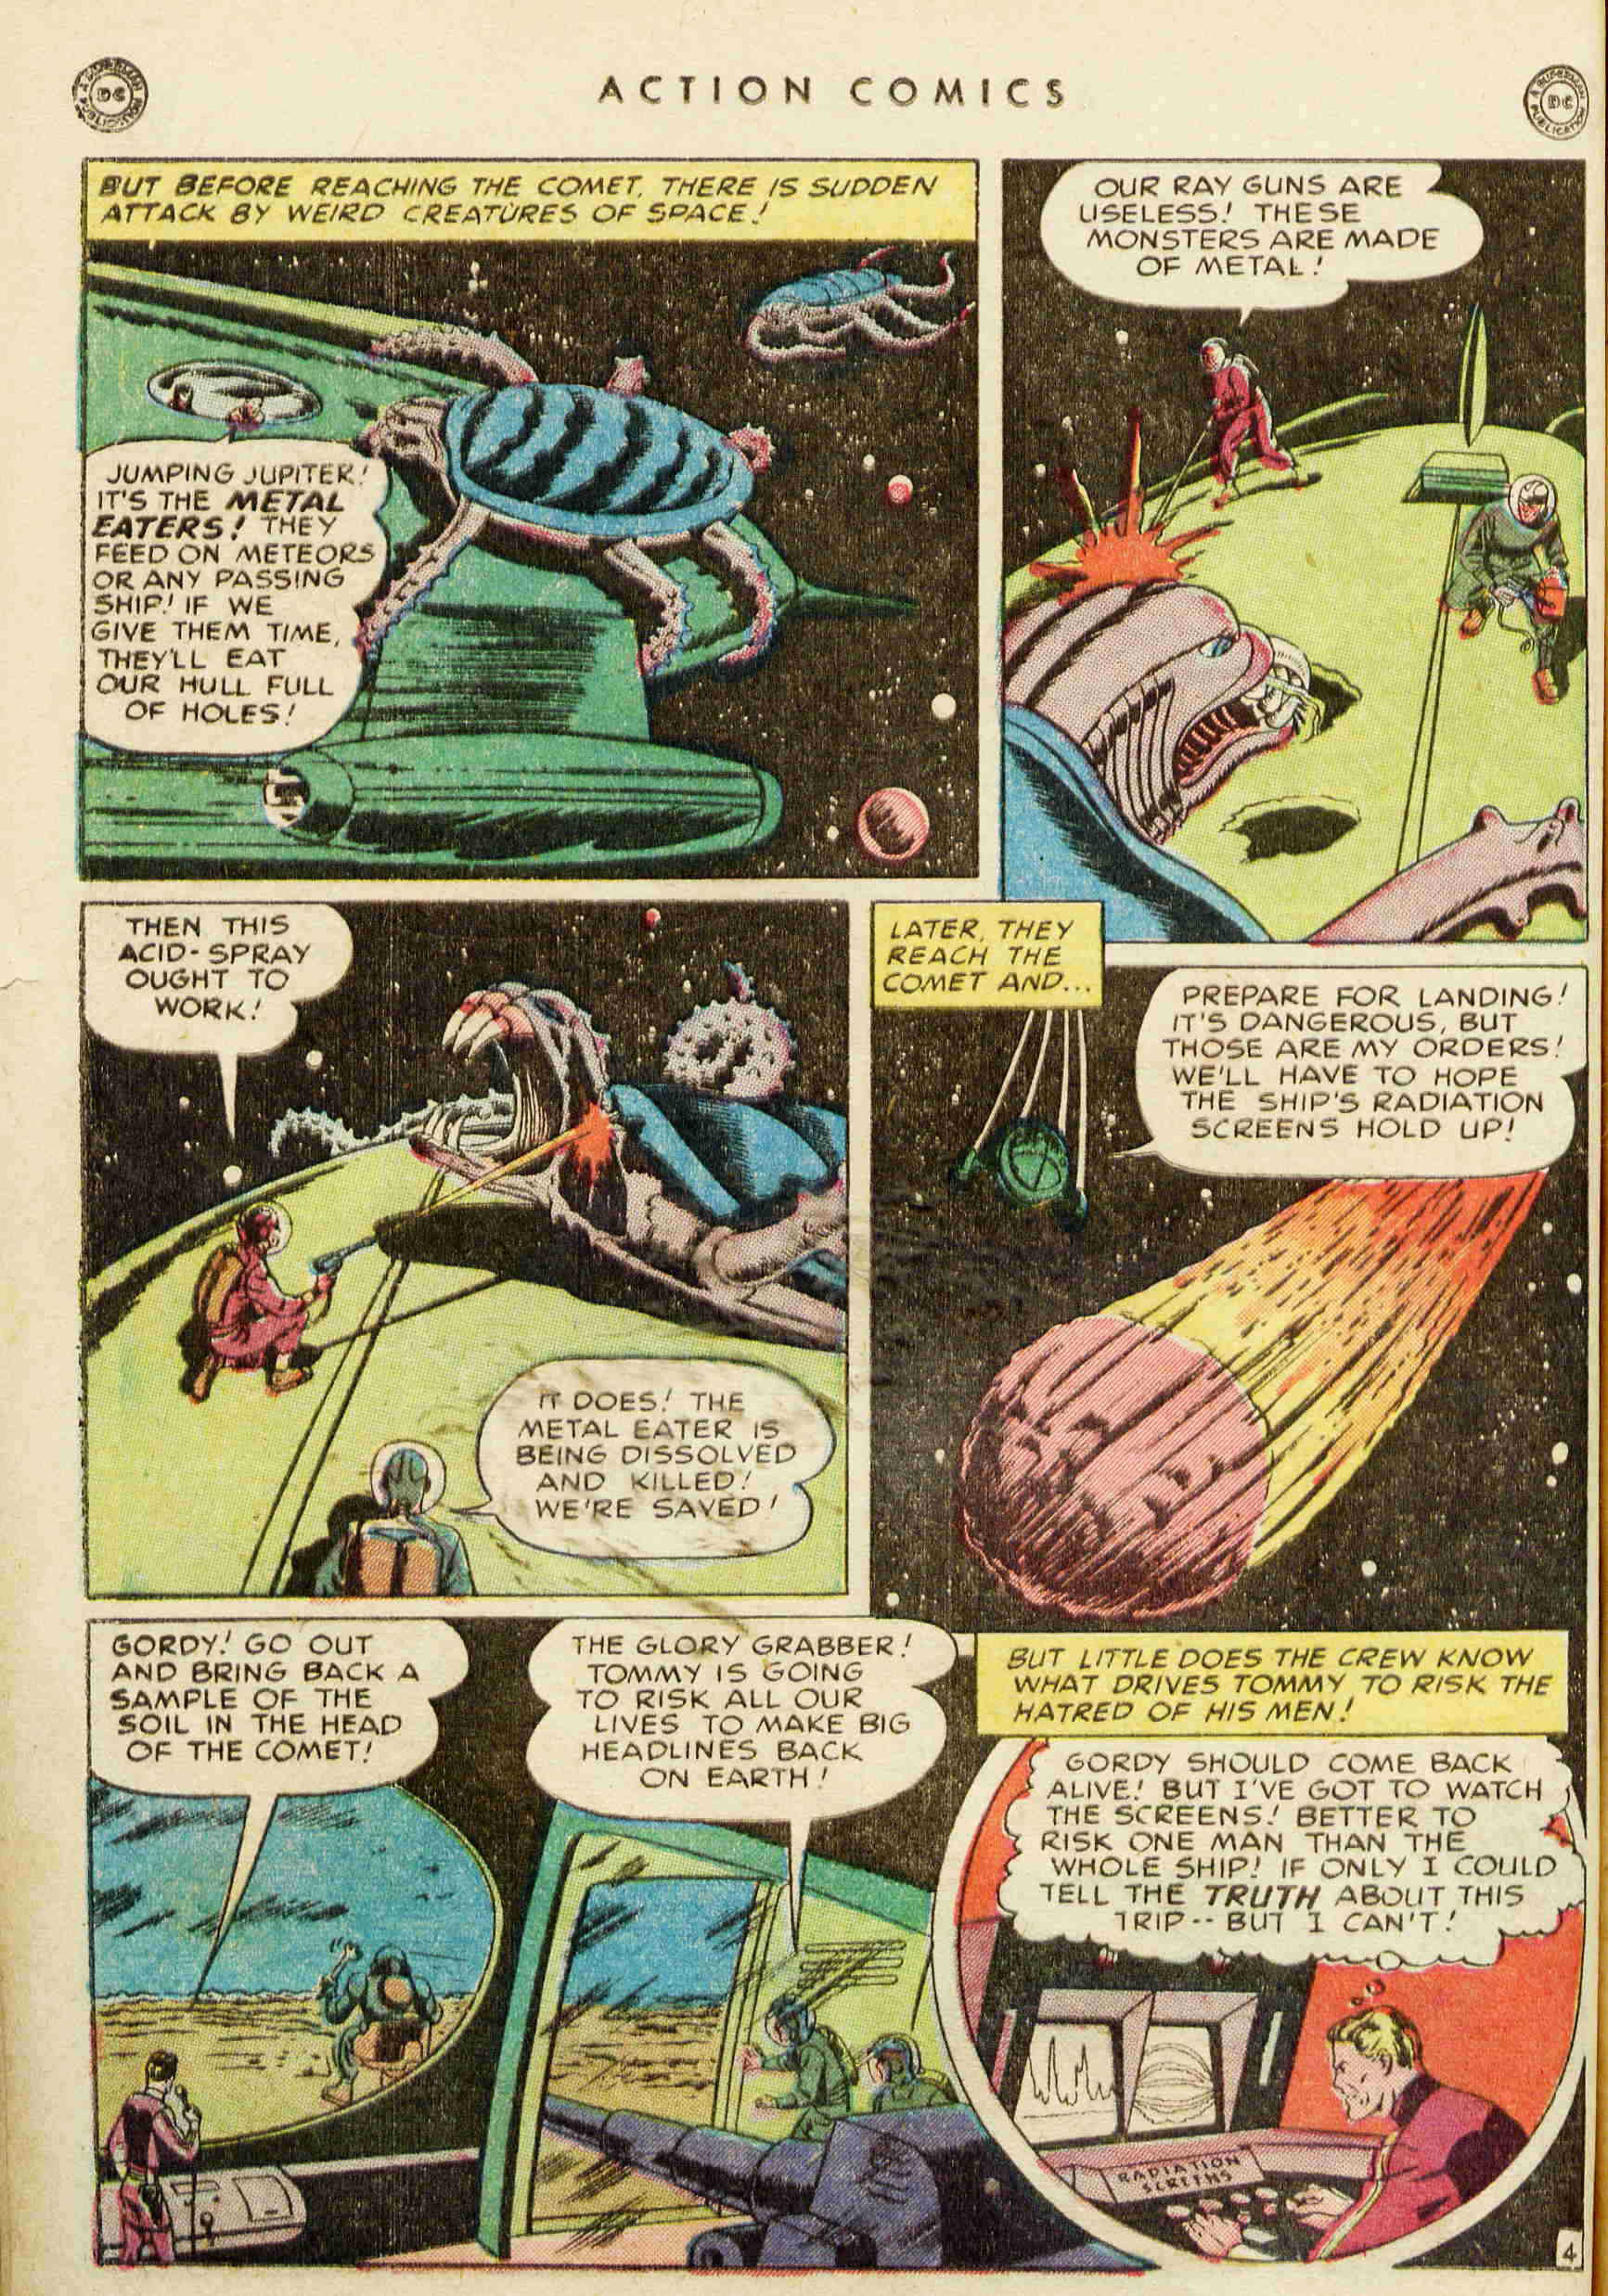 Action Comics (1938) 129 Page 32